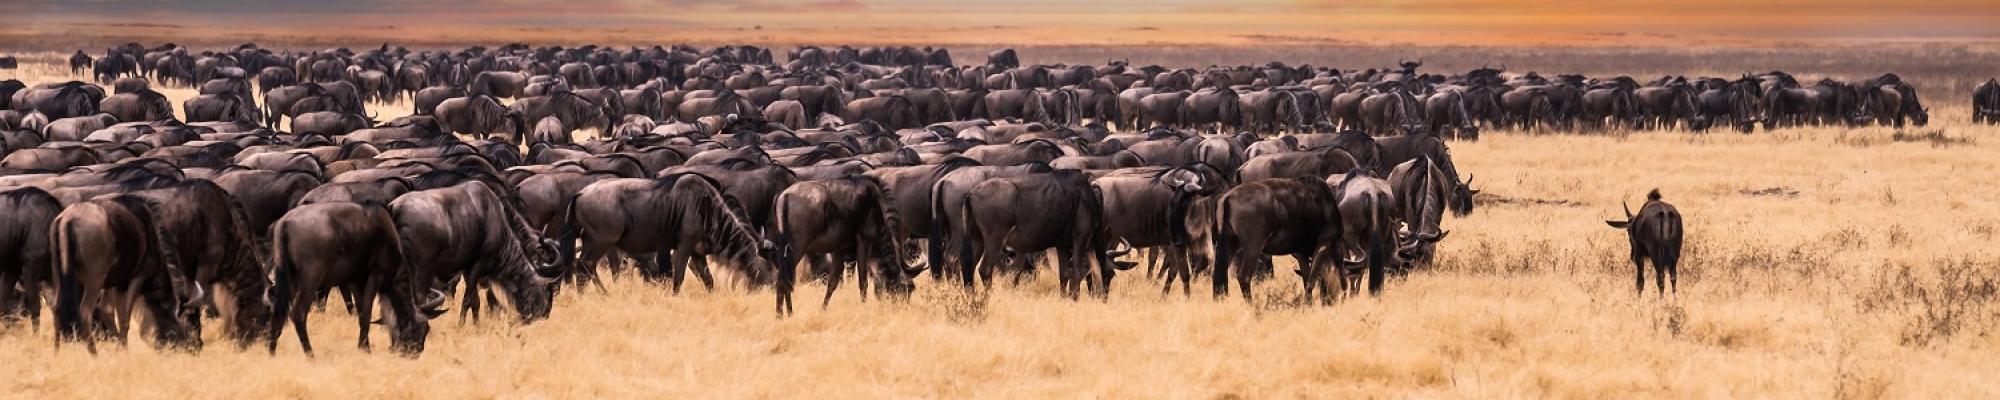 Voyage Tanzanie Safari Serengeti